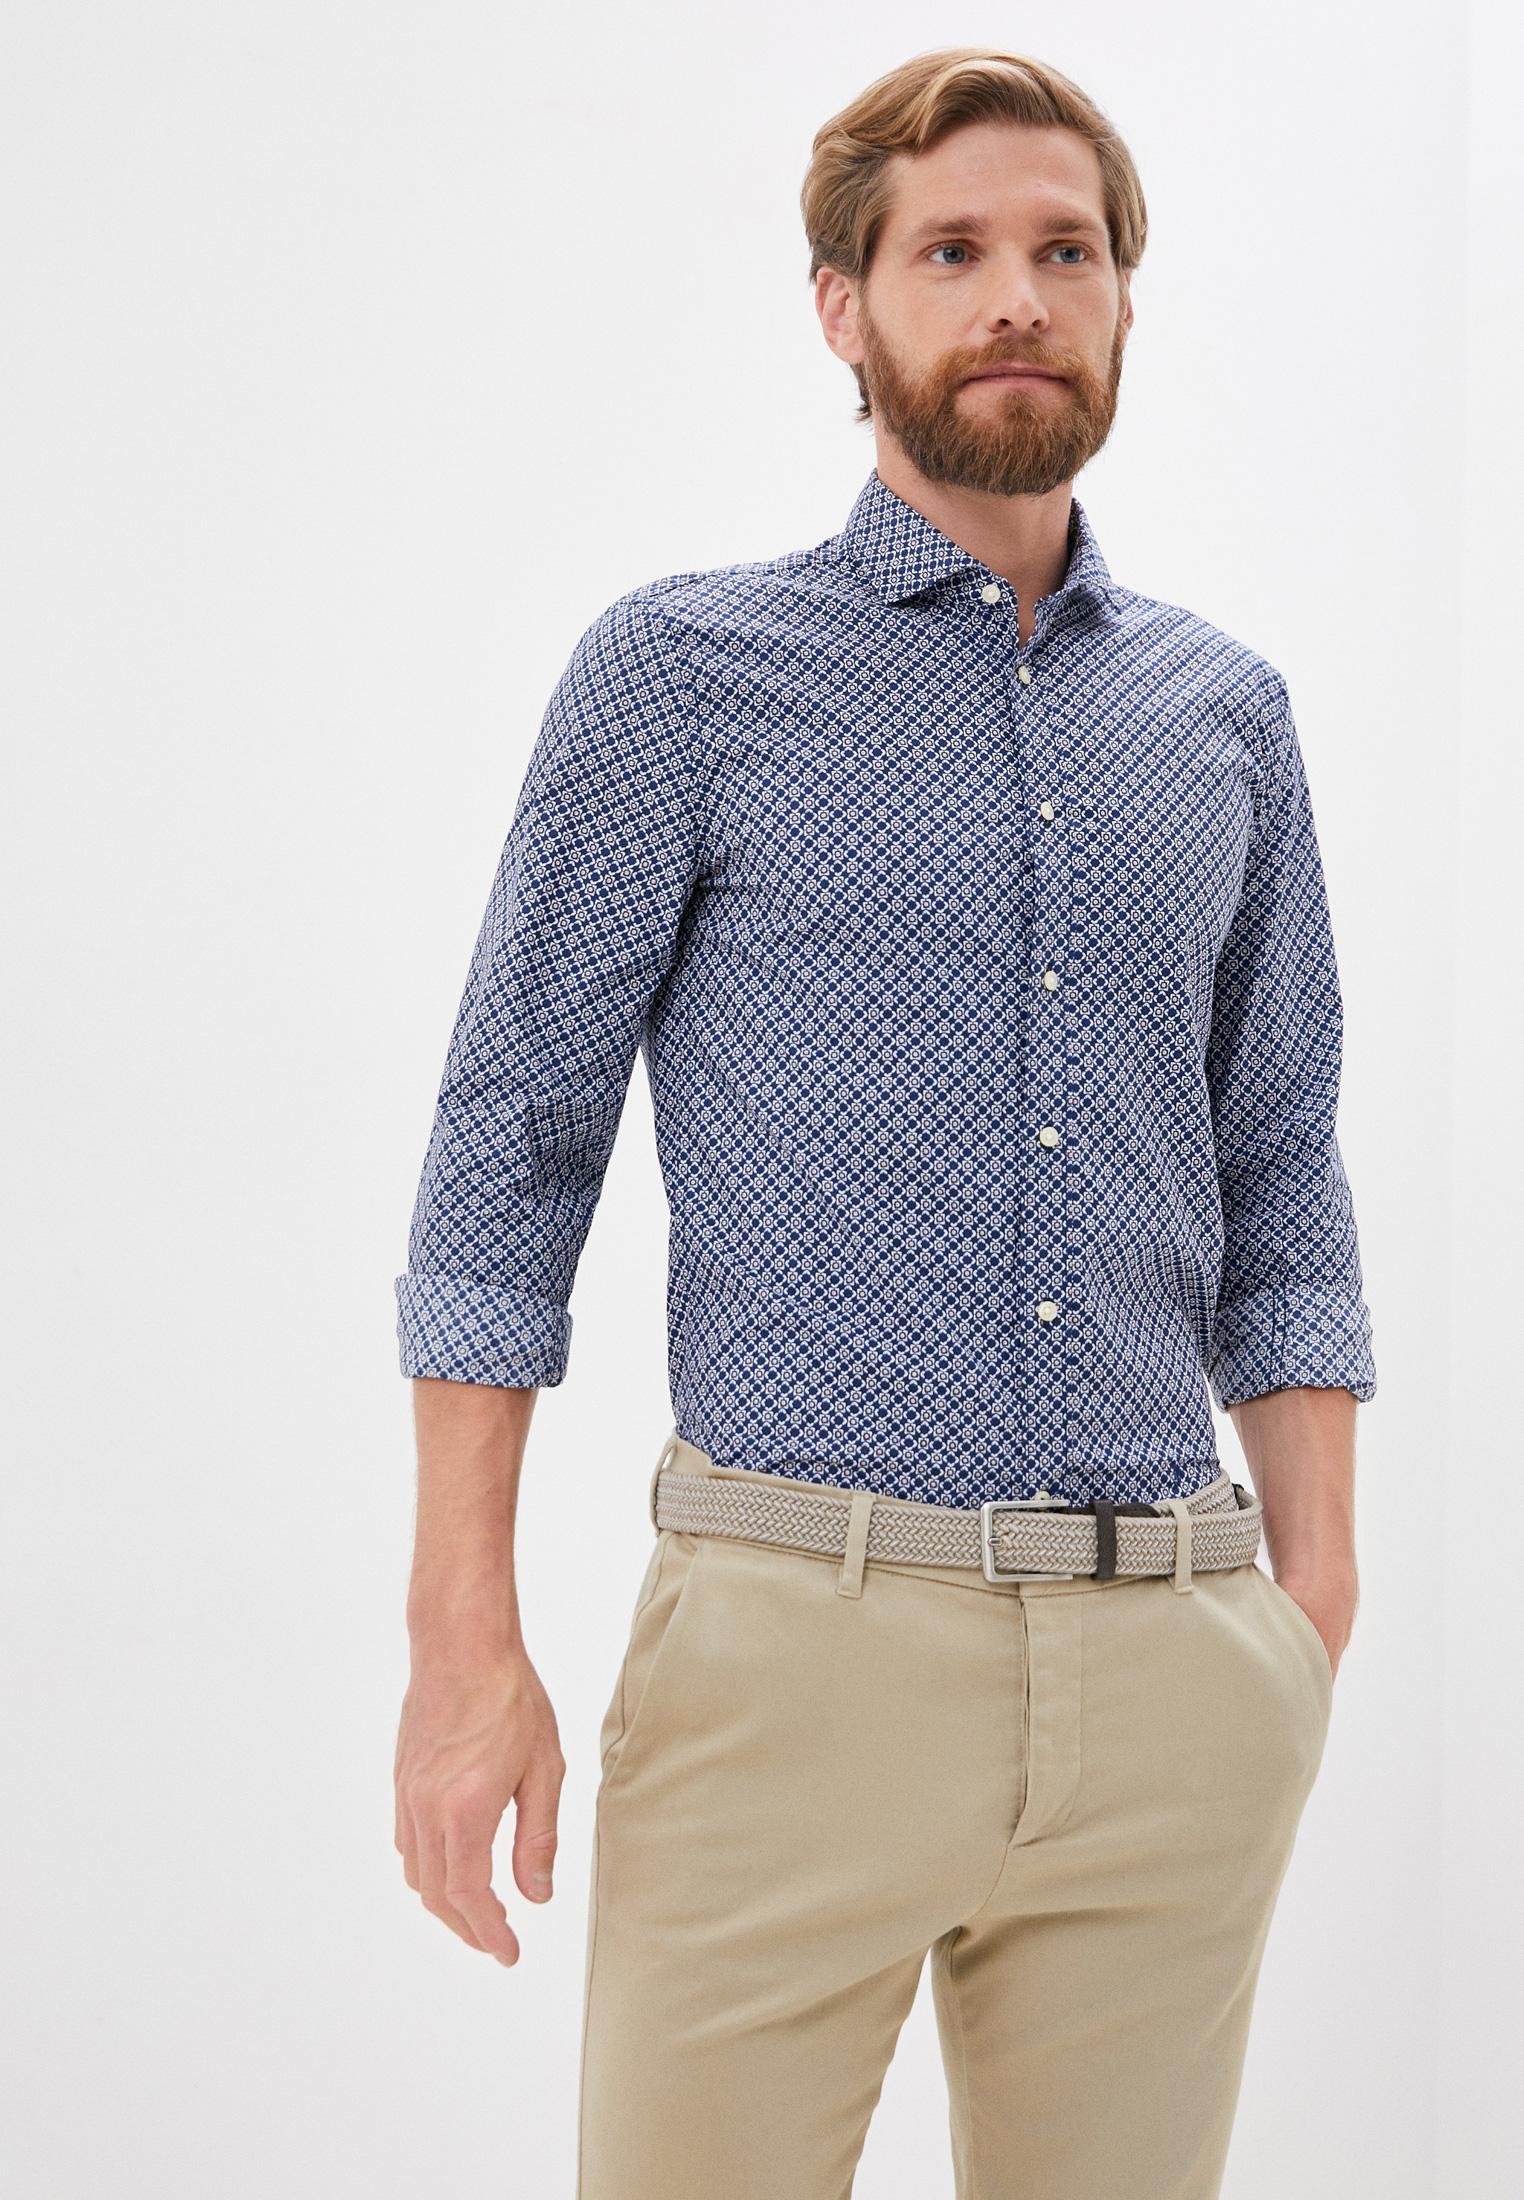 Рубашка с длинным рукавом Pepe Jeans (Пепе Джинс) PM306518